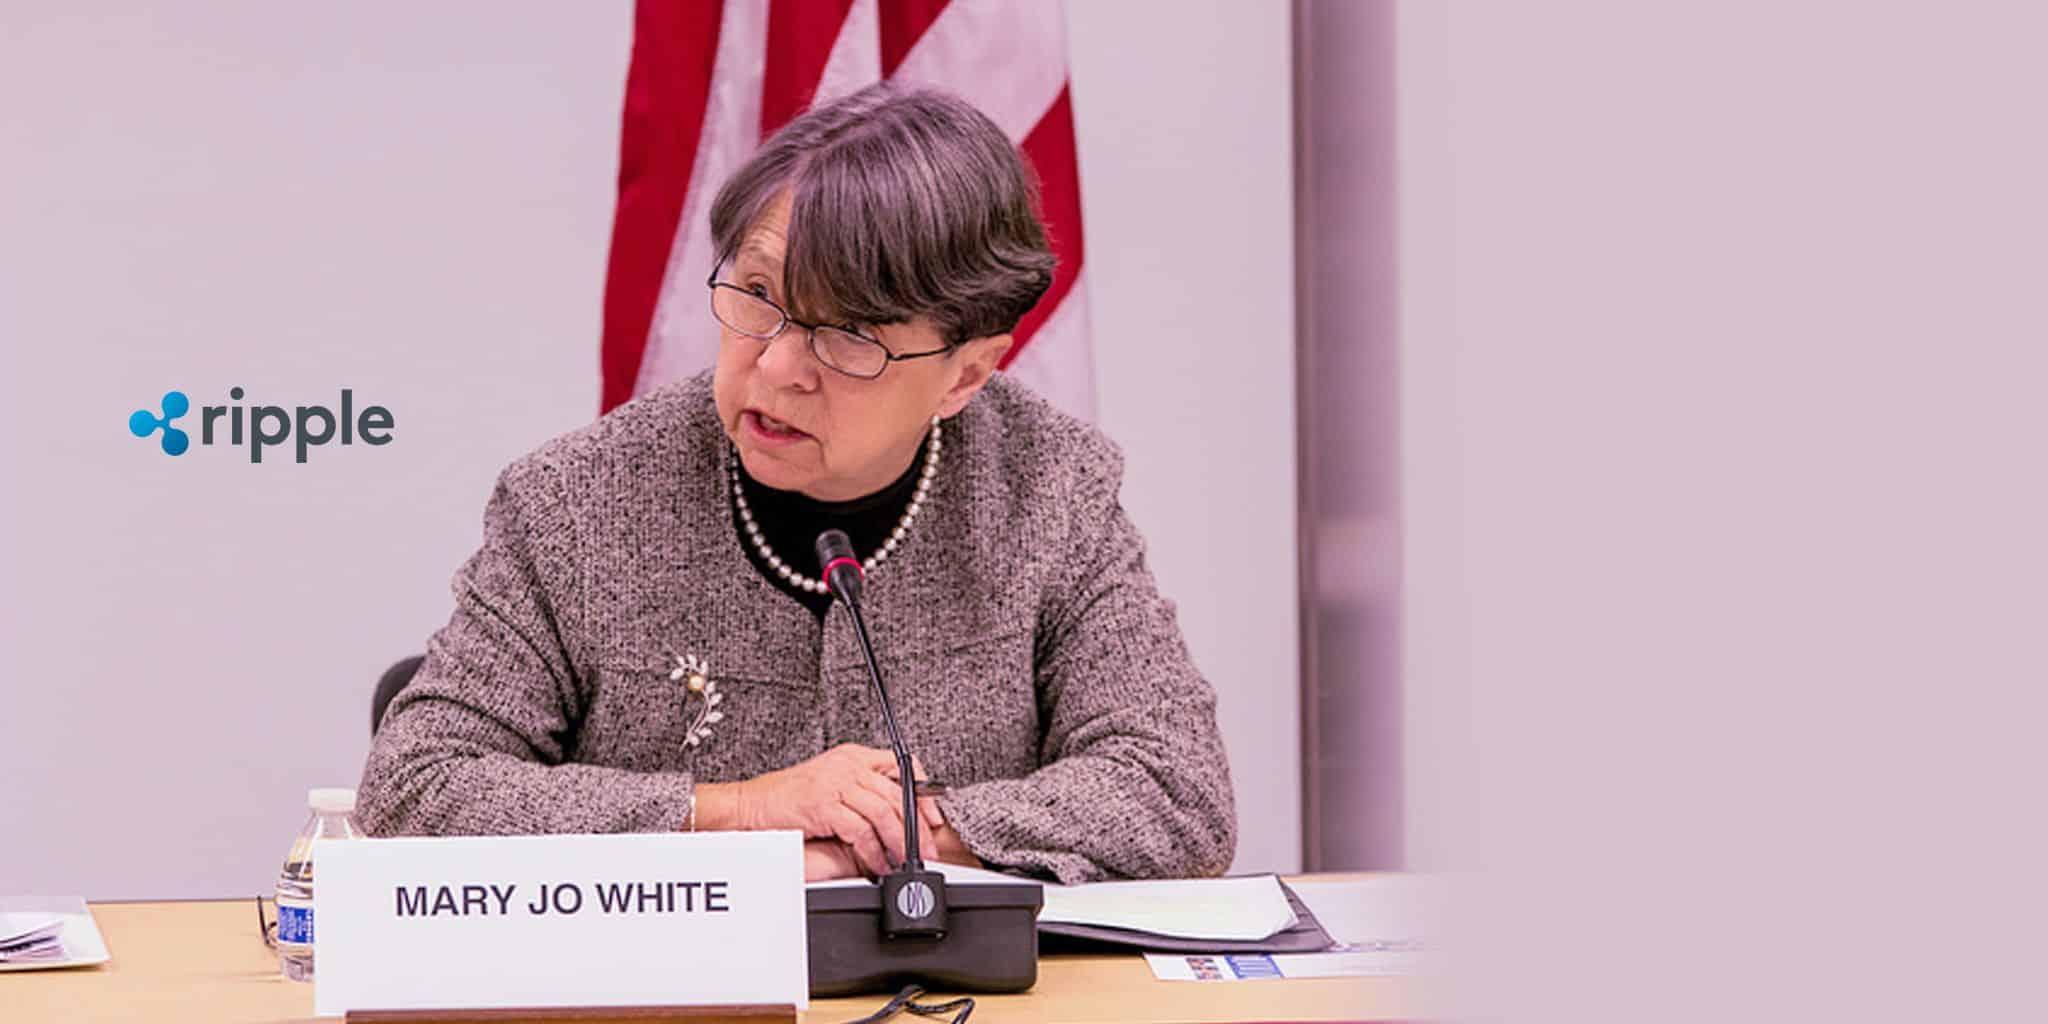 Former-SEC-Chair-Mary-Jo-White-Representing-Ripple الريبل XRP قد يتم اعتبارها أوراقا مالية وهذا مصيرها